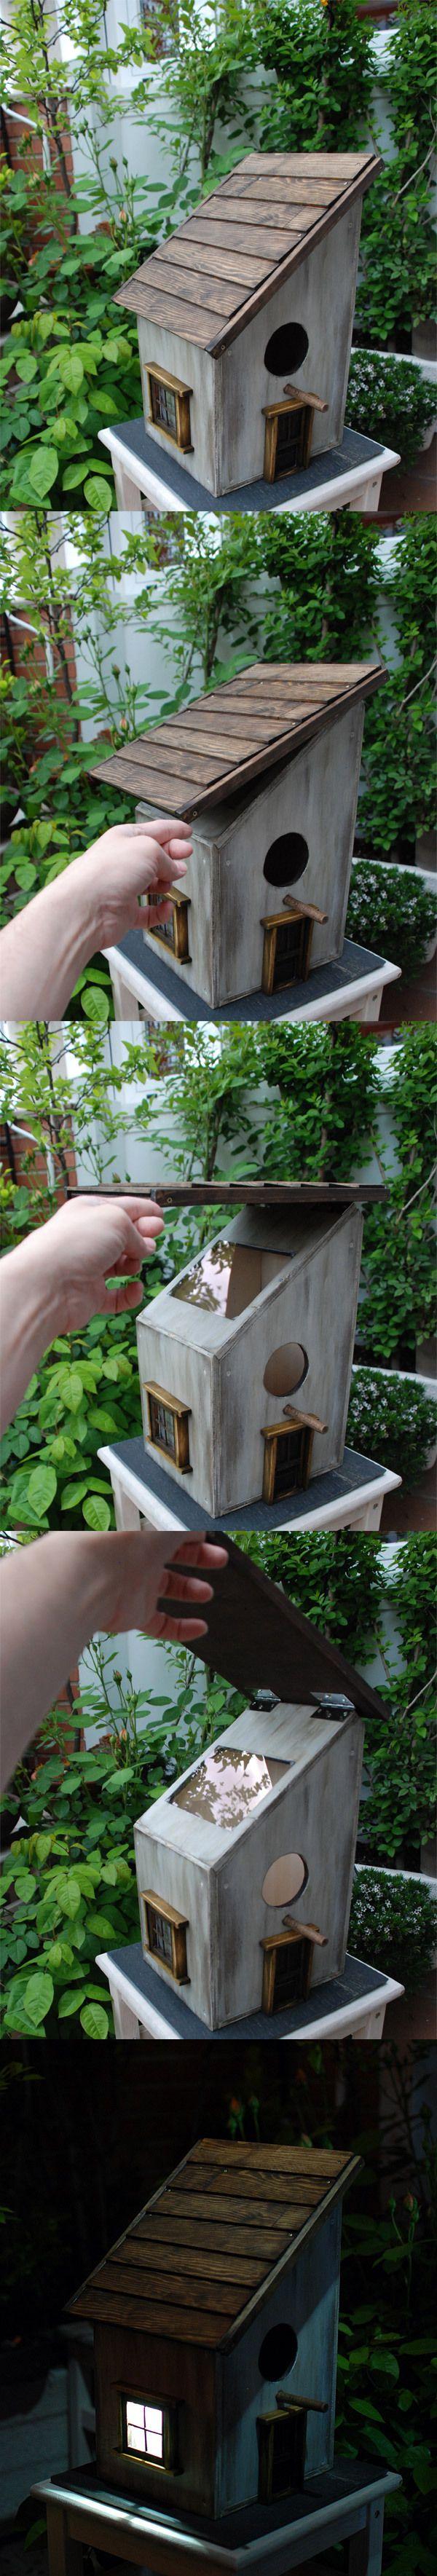 Solar Birdhouse with viewer by Gustavo Ramos Bustos, via Behance